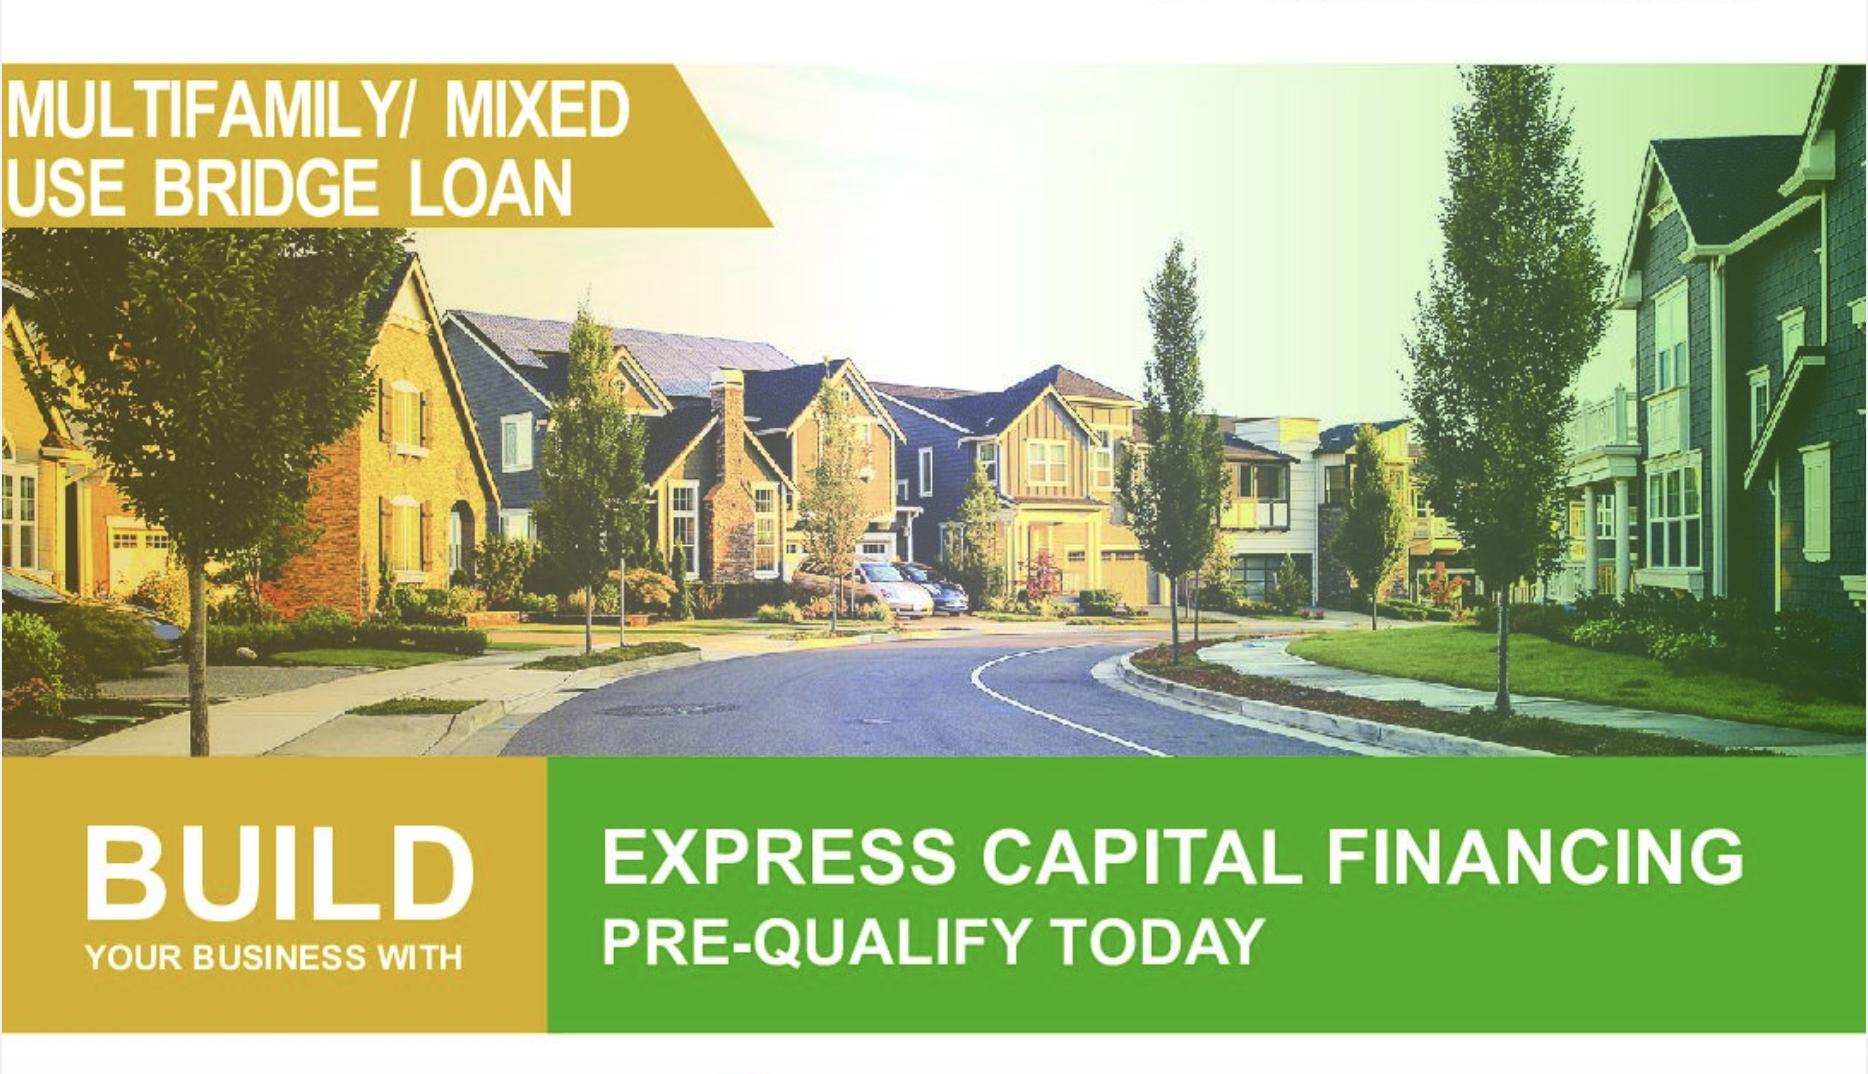 Multi Family Mixed Use Bridge Loan